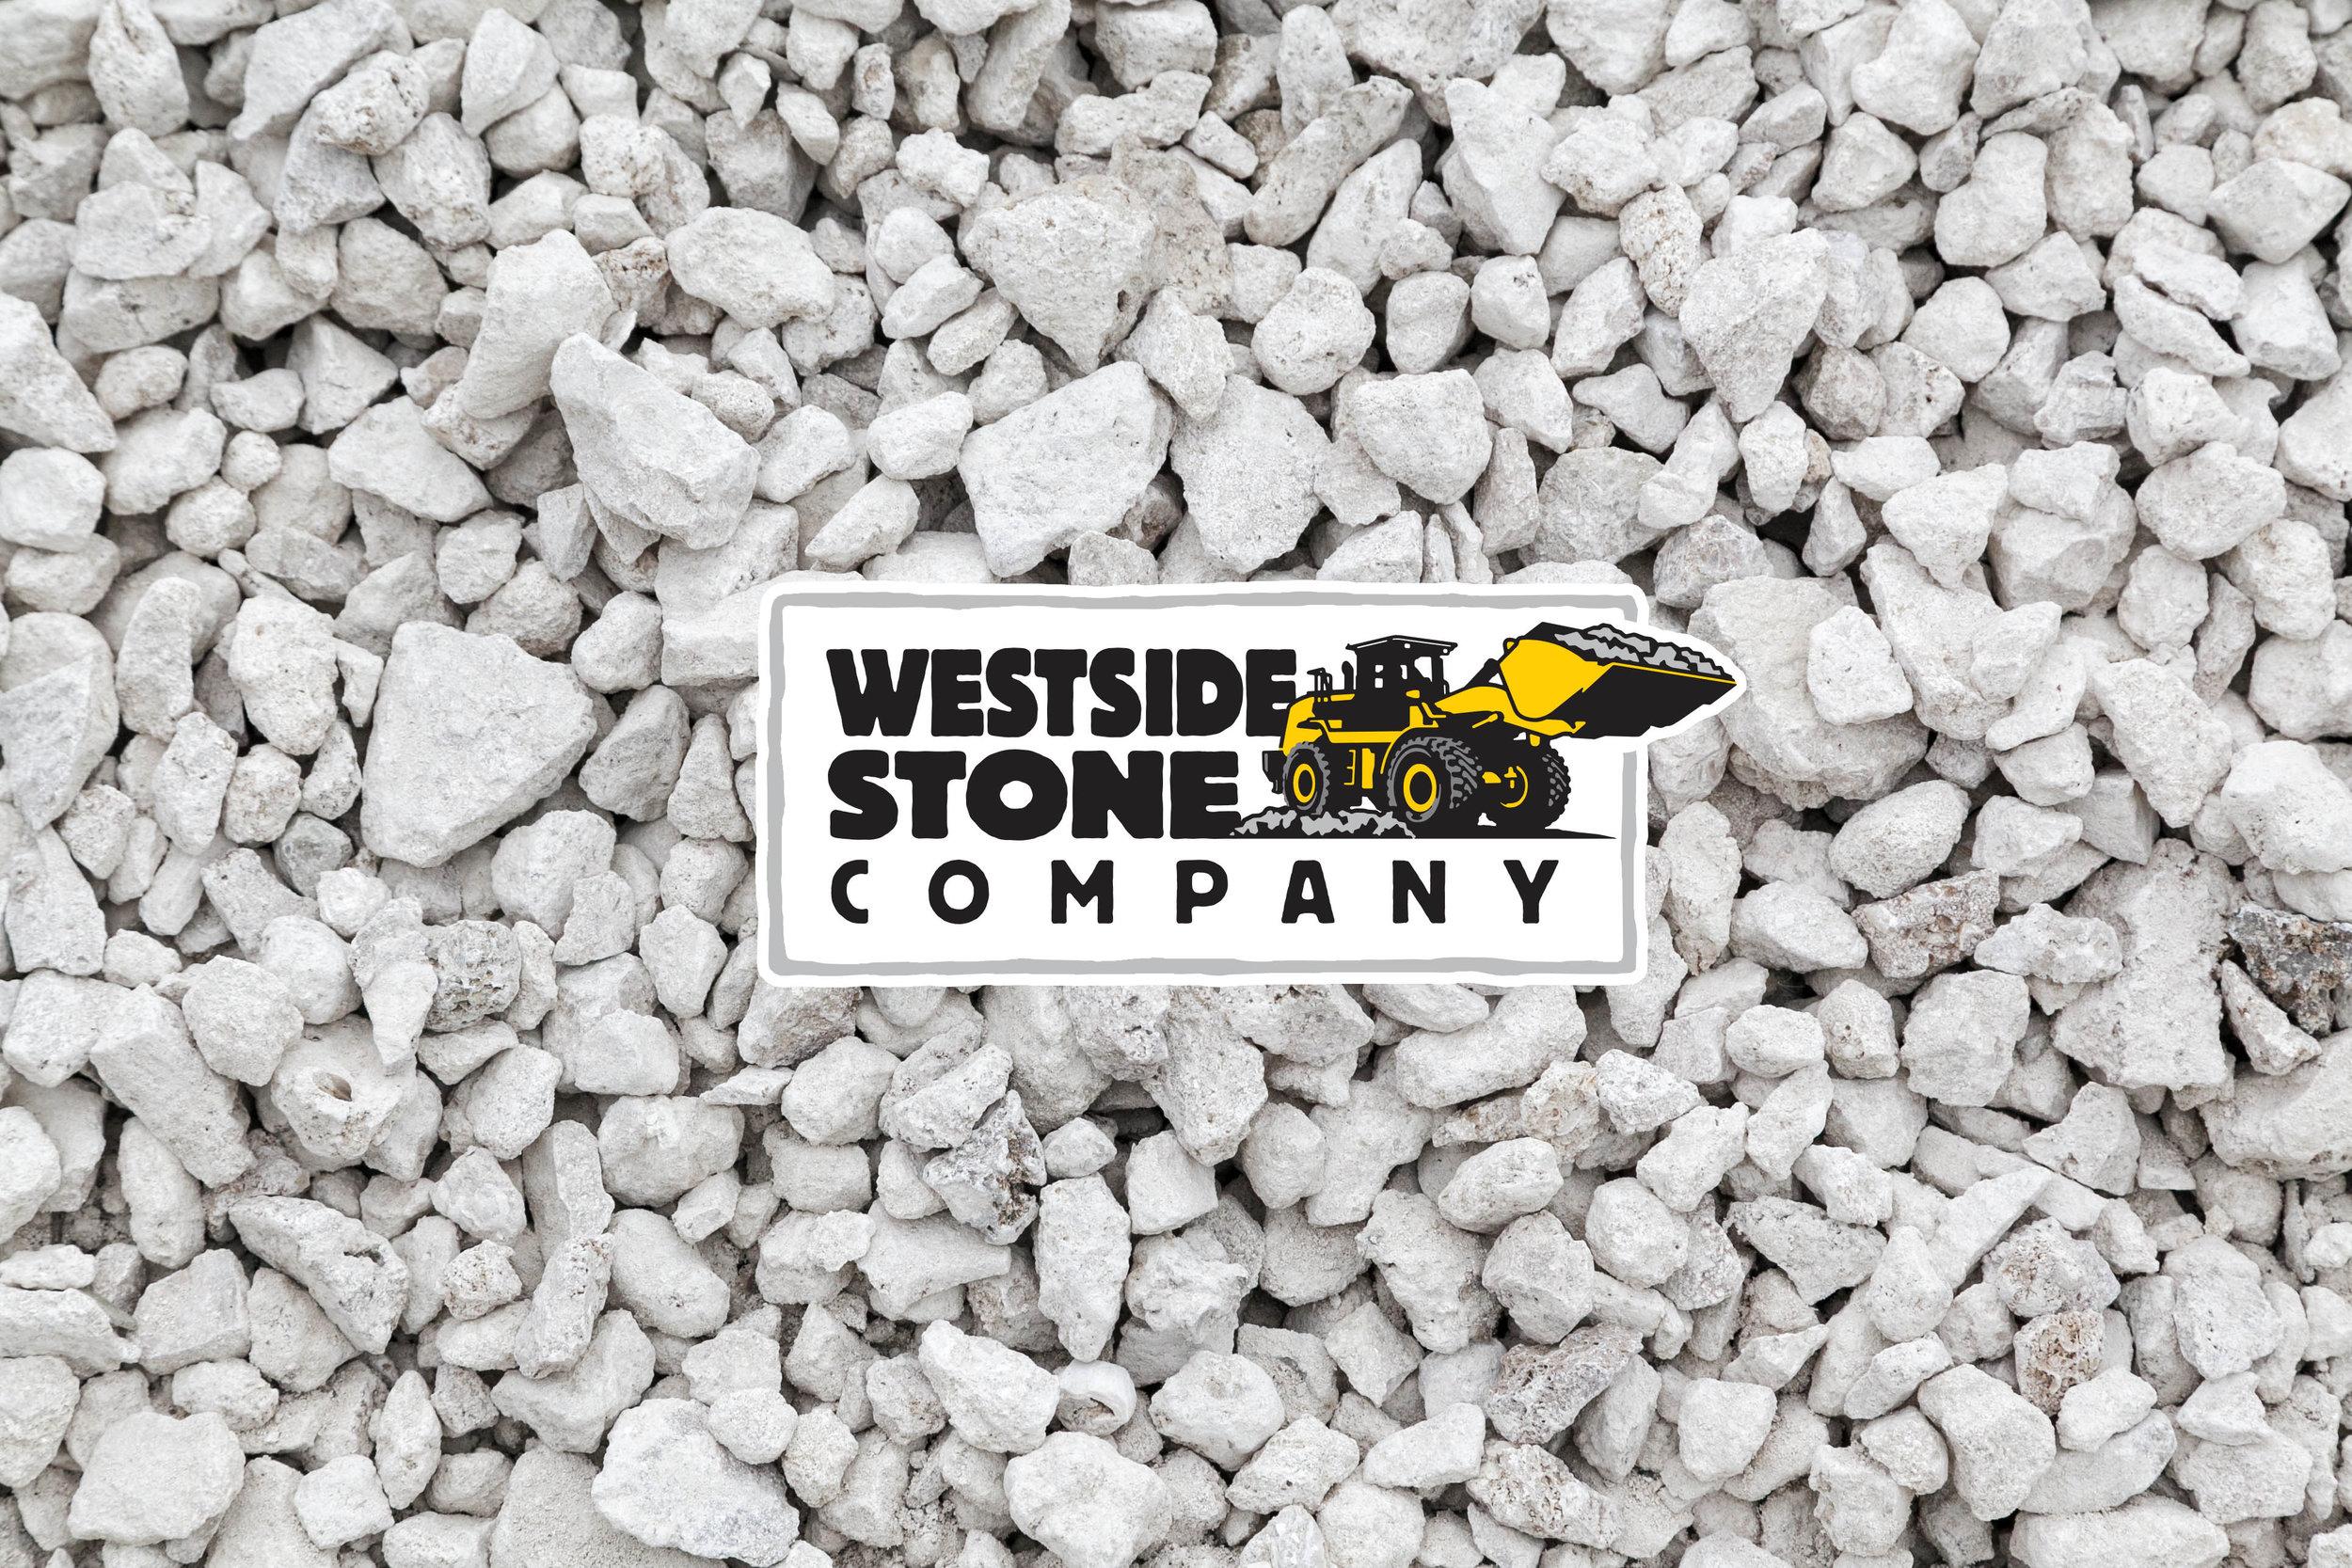 4-WestsideStonePlaceholder.jpg